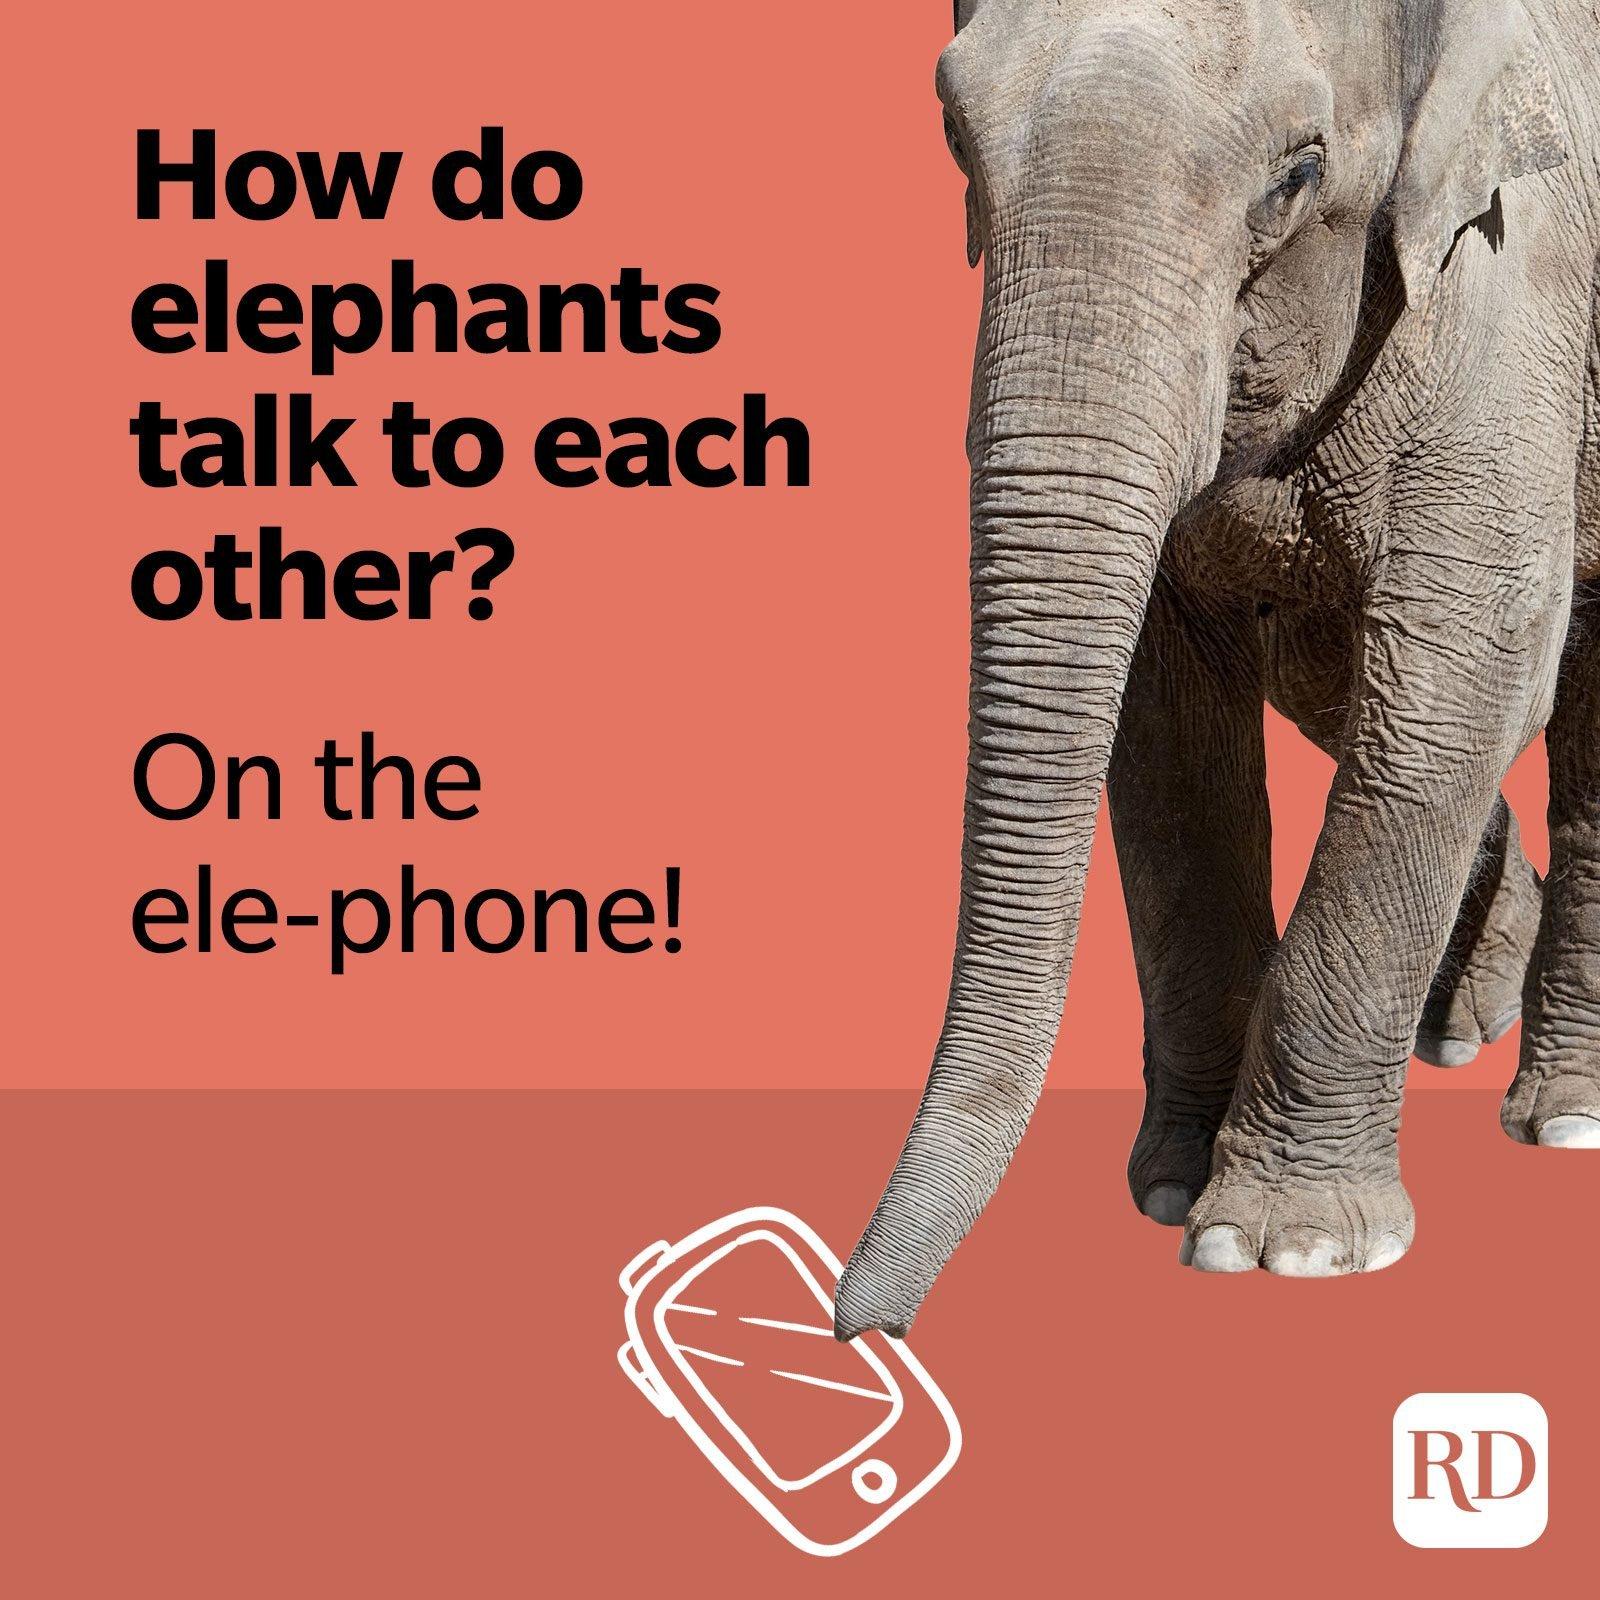 How do elephants talk to each other? On the ele-phone!